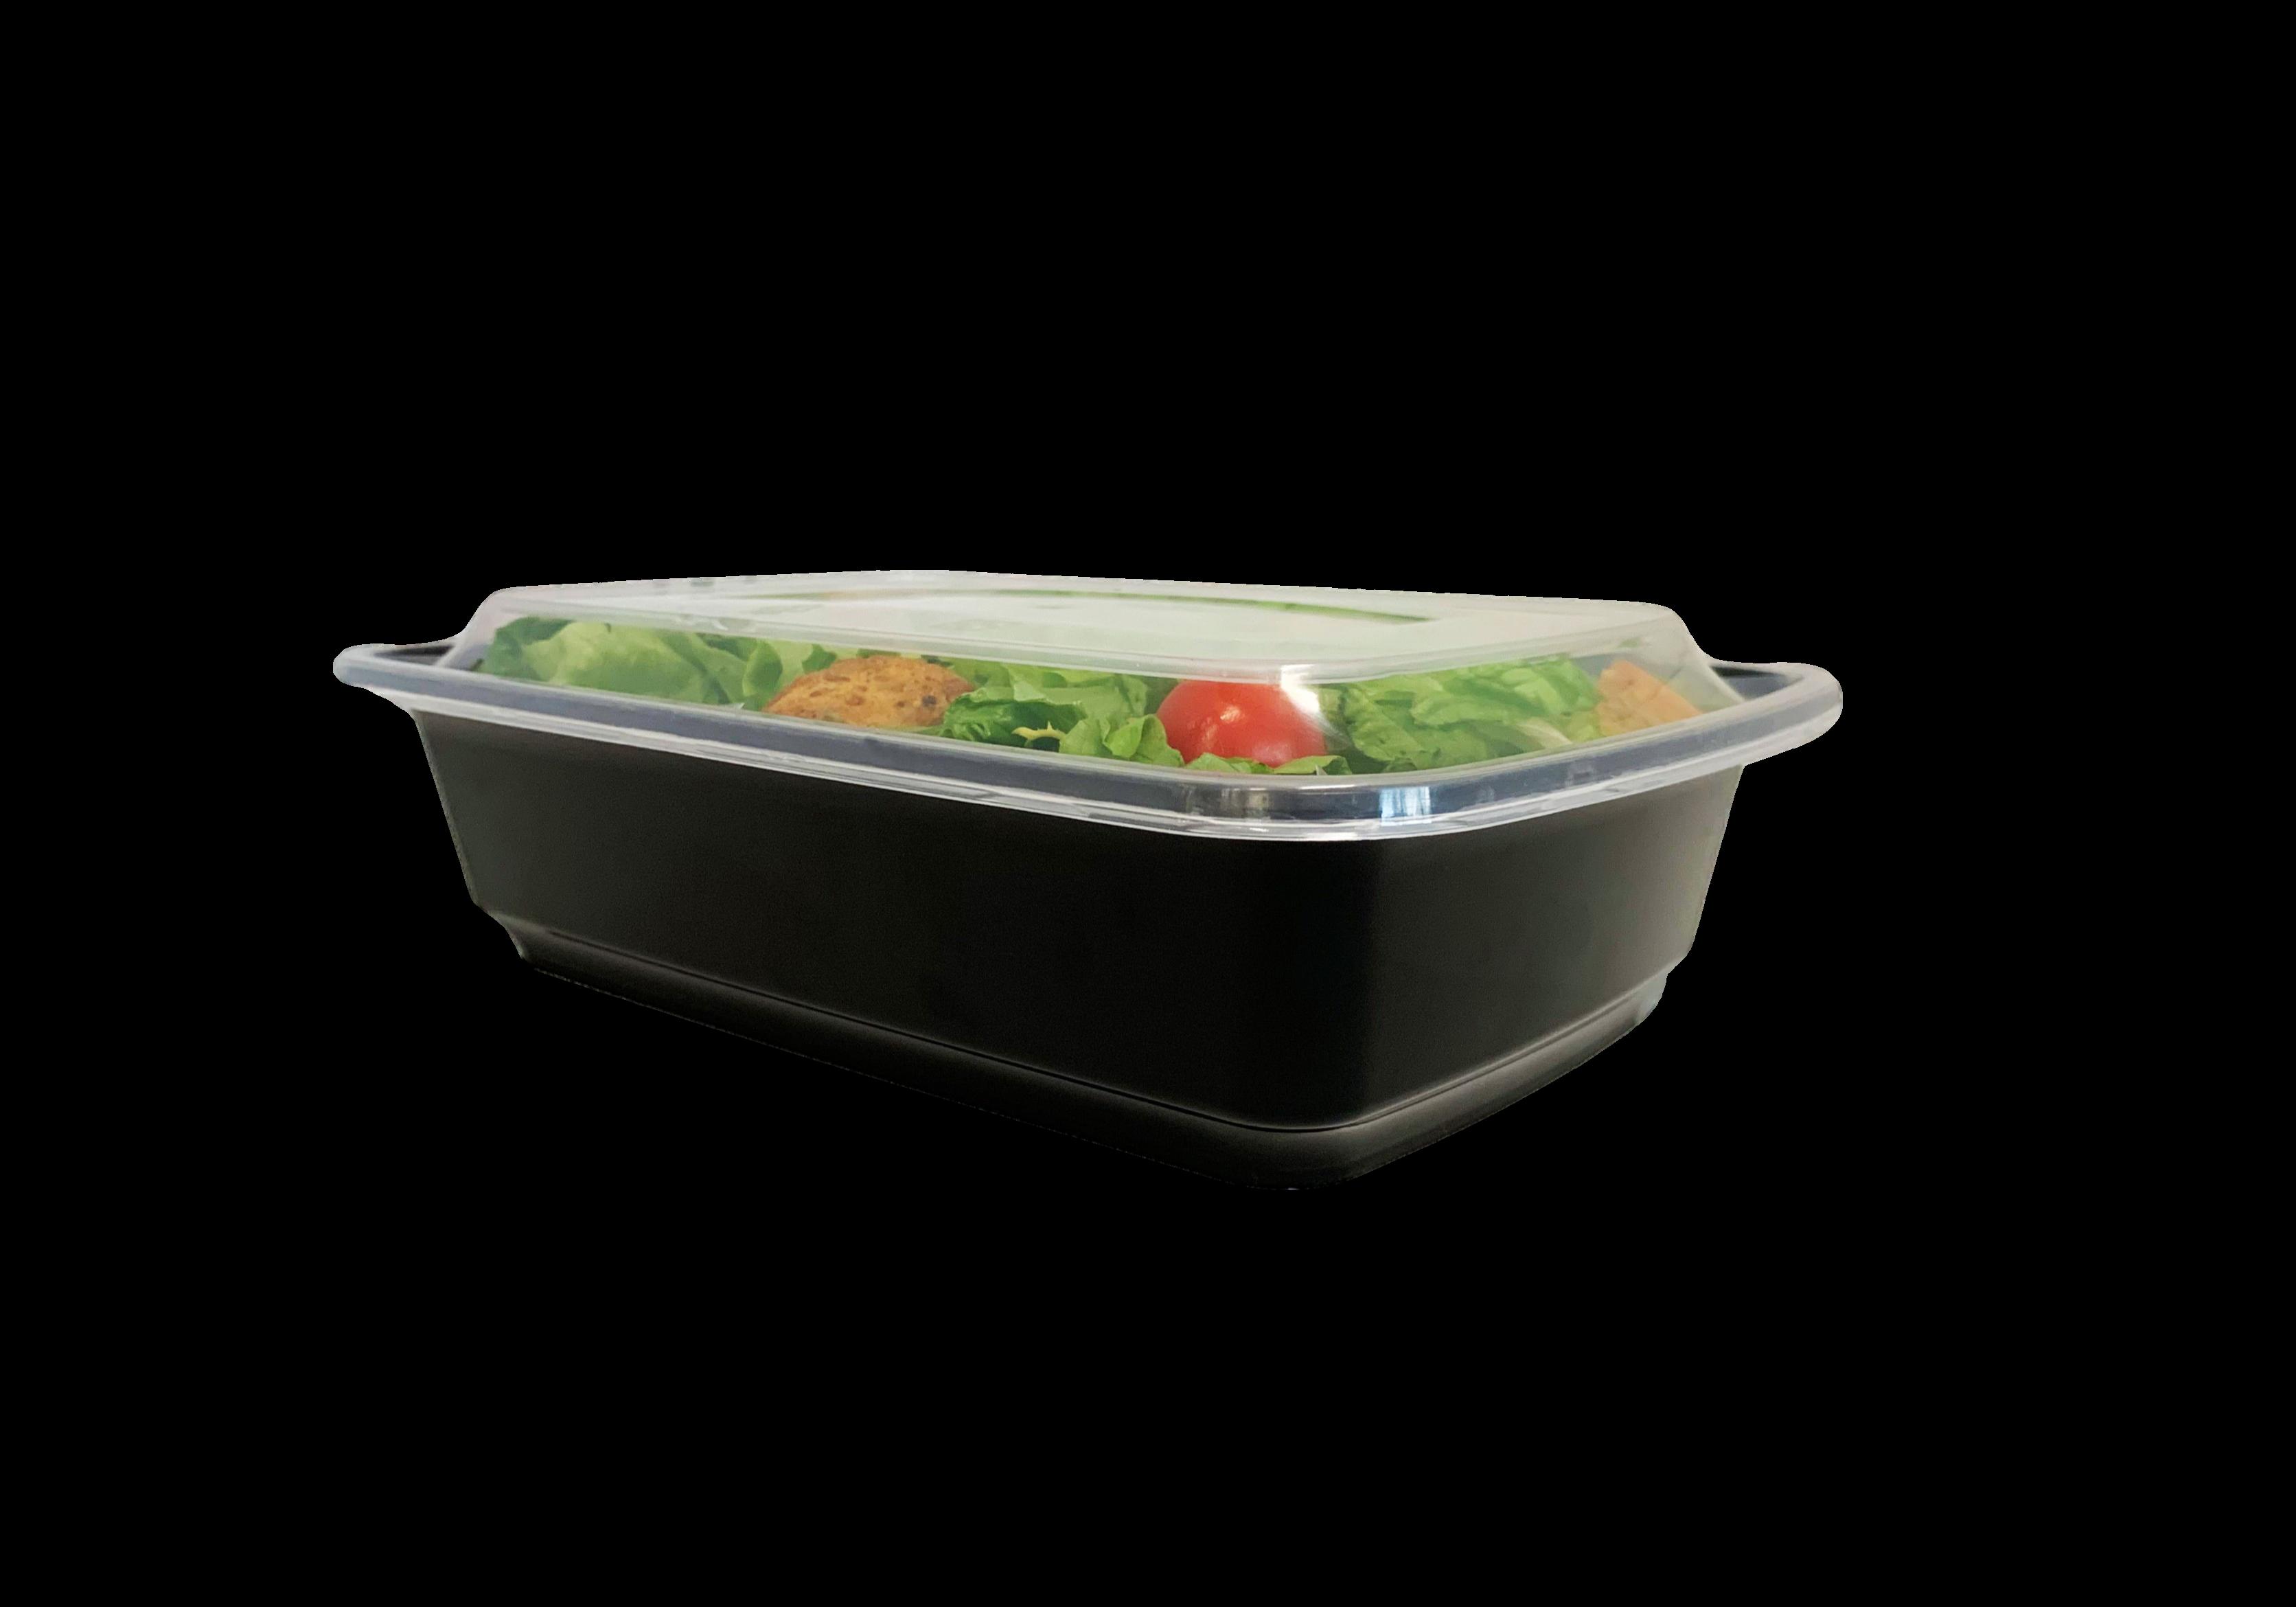 17-10084_LidOn_Salad_clipped_rev_1